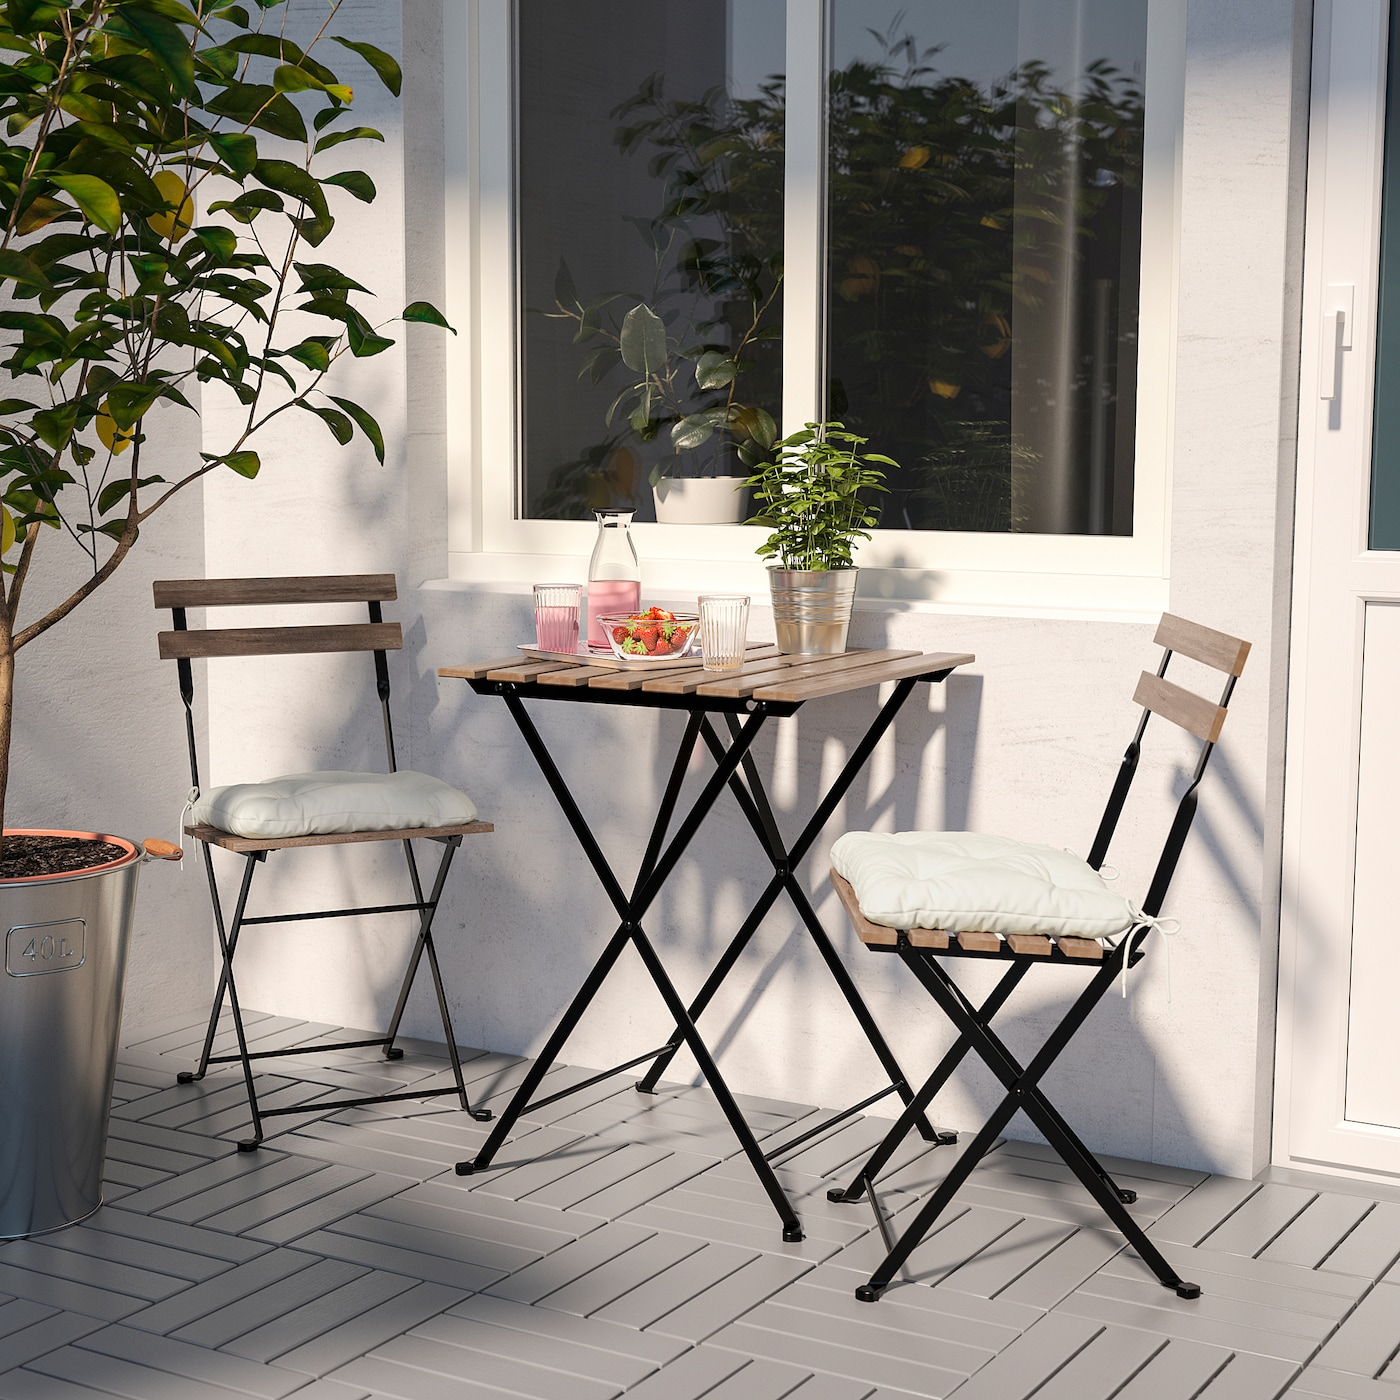 TÄRNÖ Table, outdoor - black/light brown stained 9x9 cm